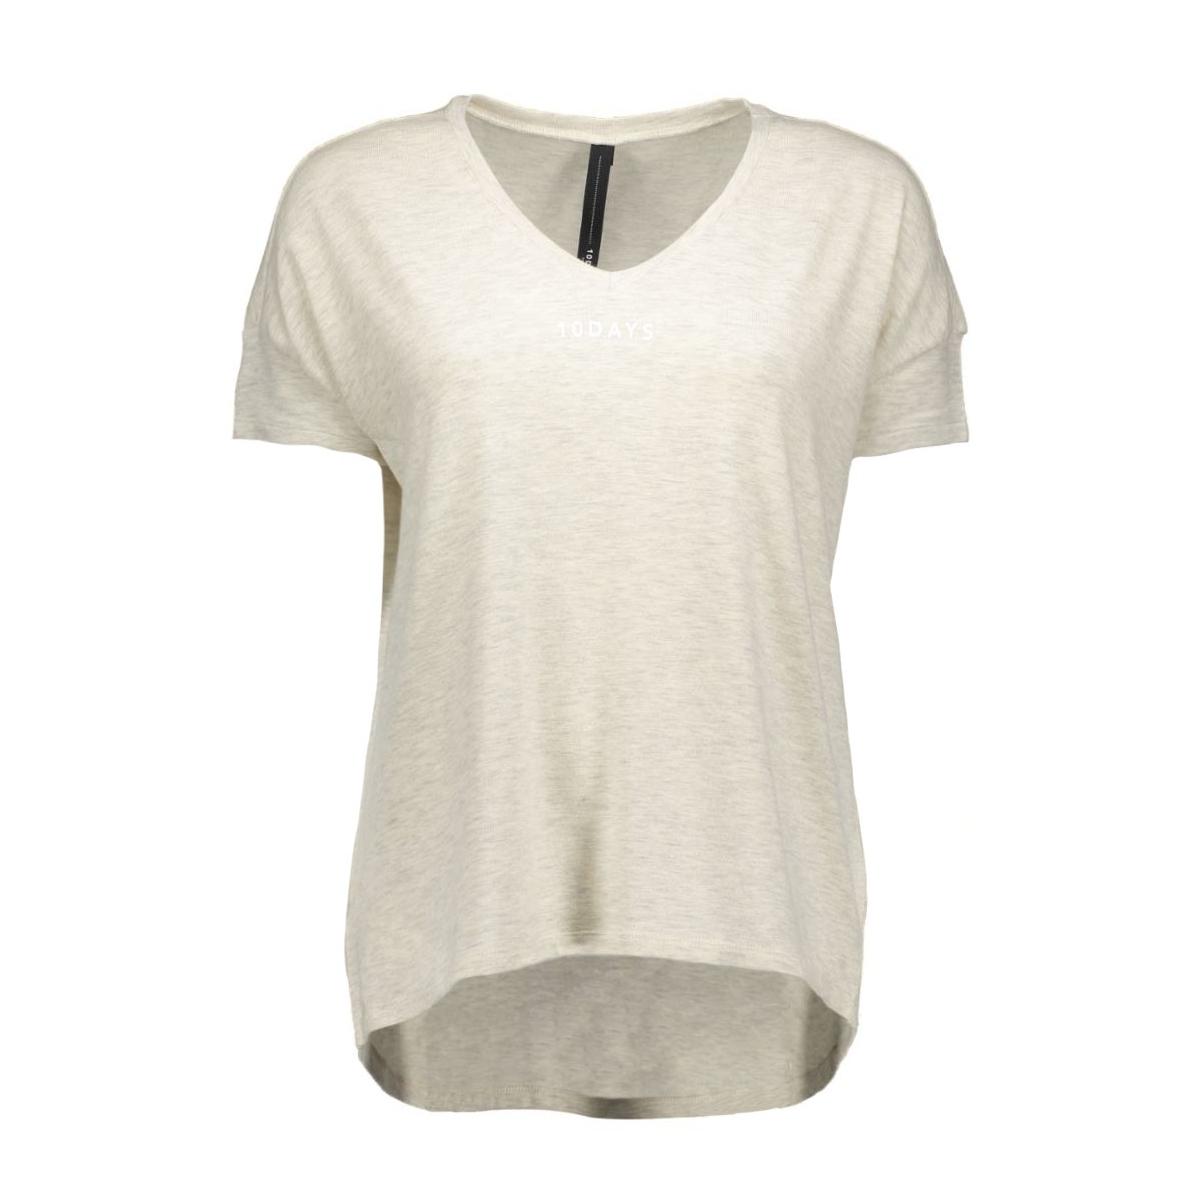 16wi-744 10 days t-shirt 17-0117 soft white melee